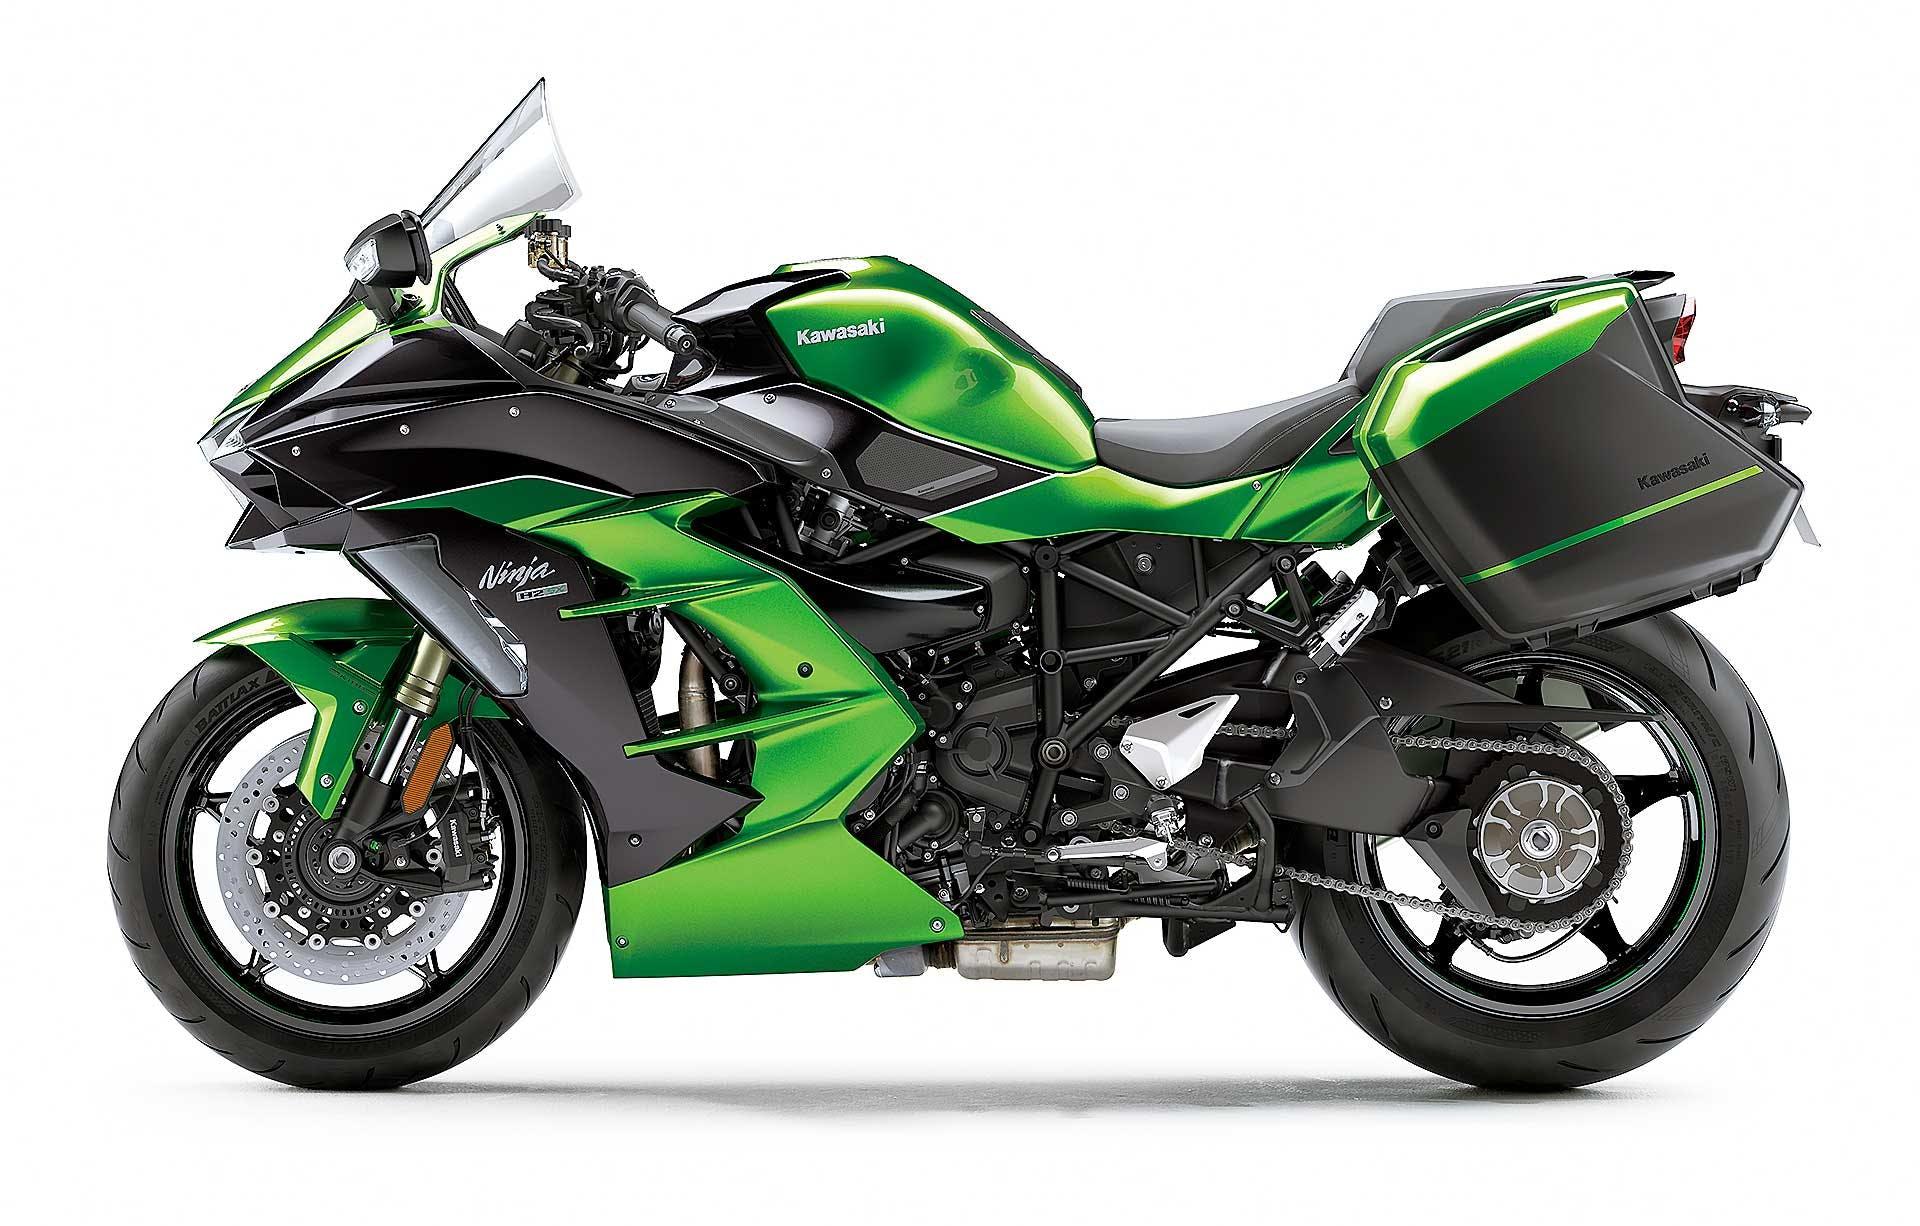 Kawasaki Ninja H2 SX laterale su sfondo biacno